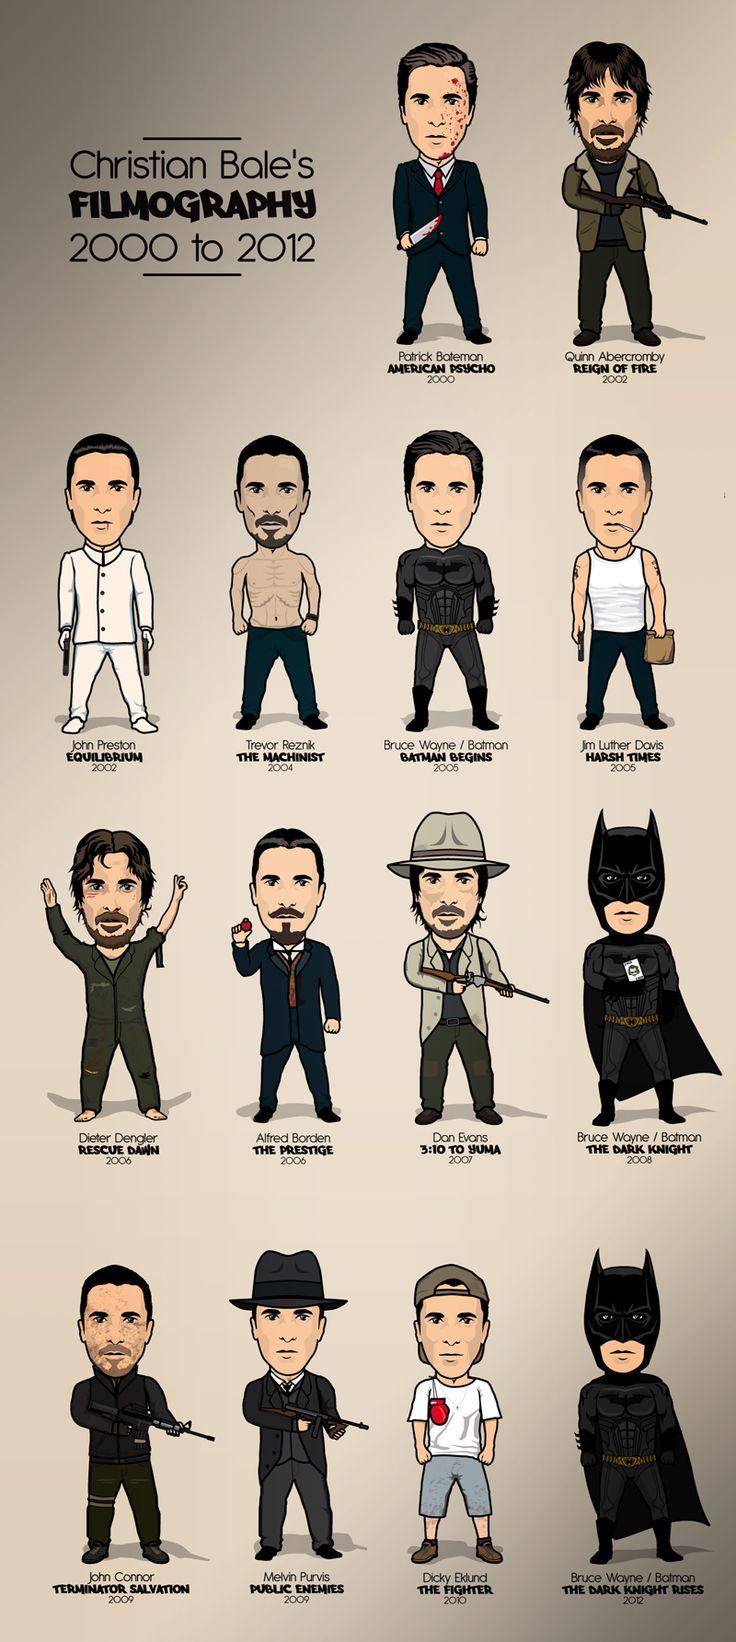 Christian Bale Fan Art: Movie Characters 2000-2012 - Christian Bale | Baleheads Blog